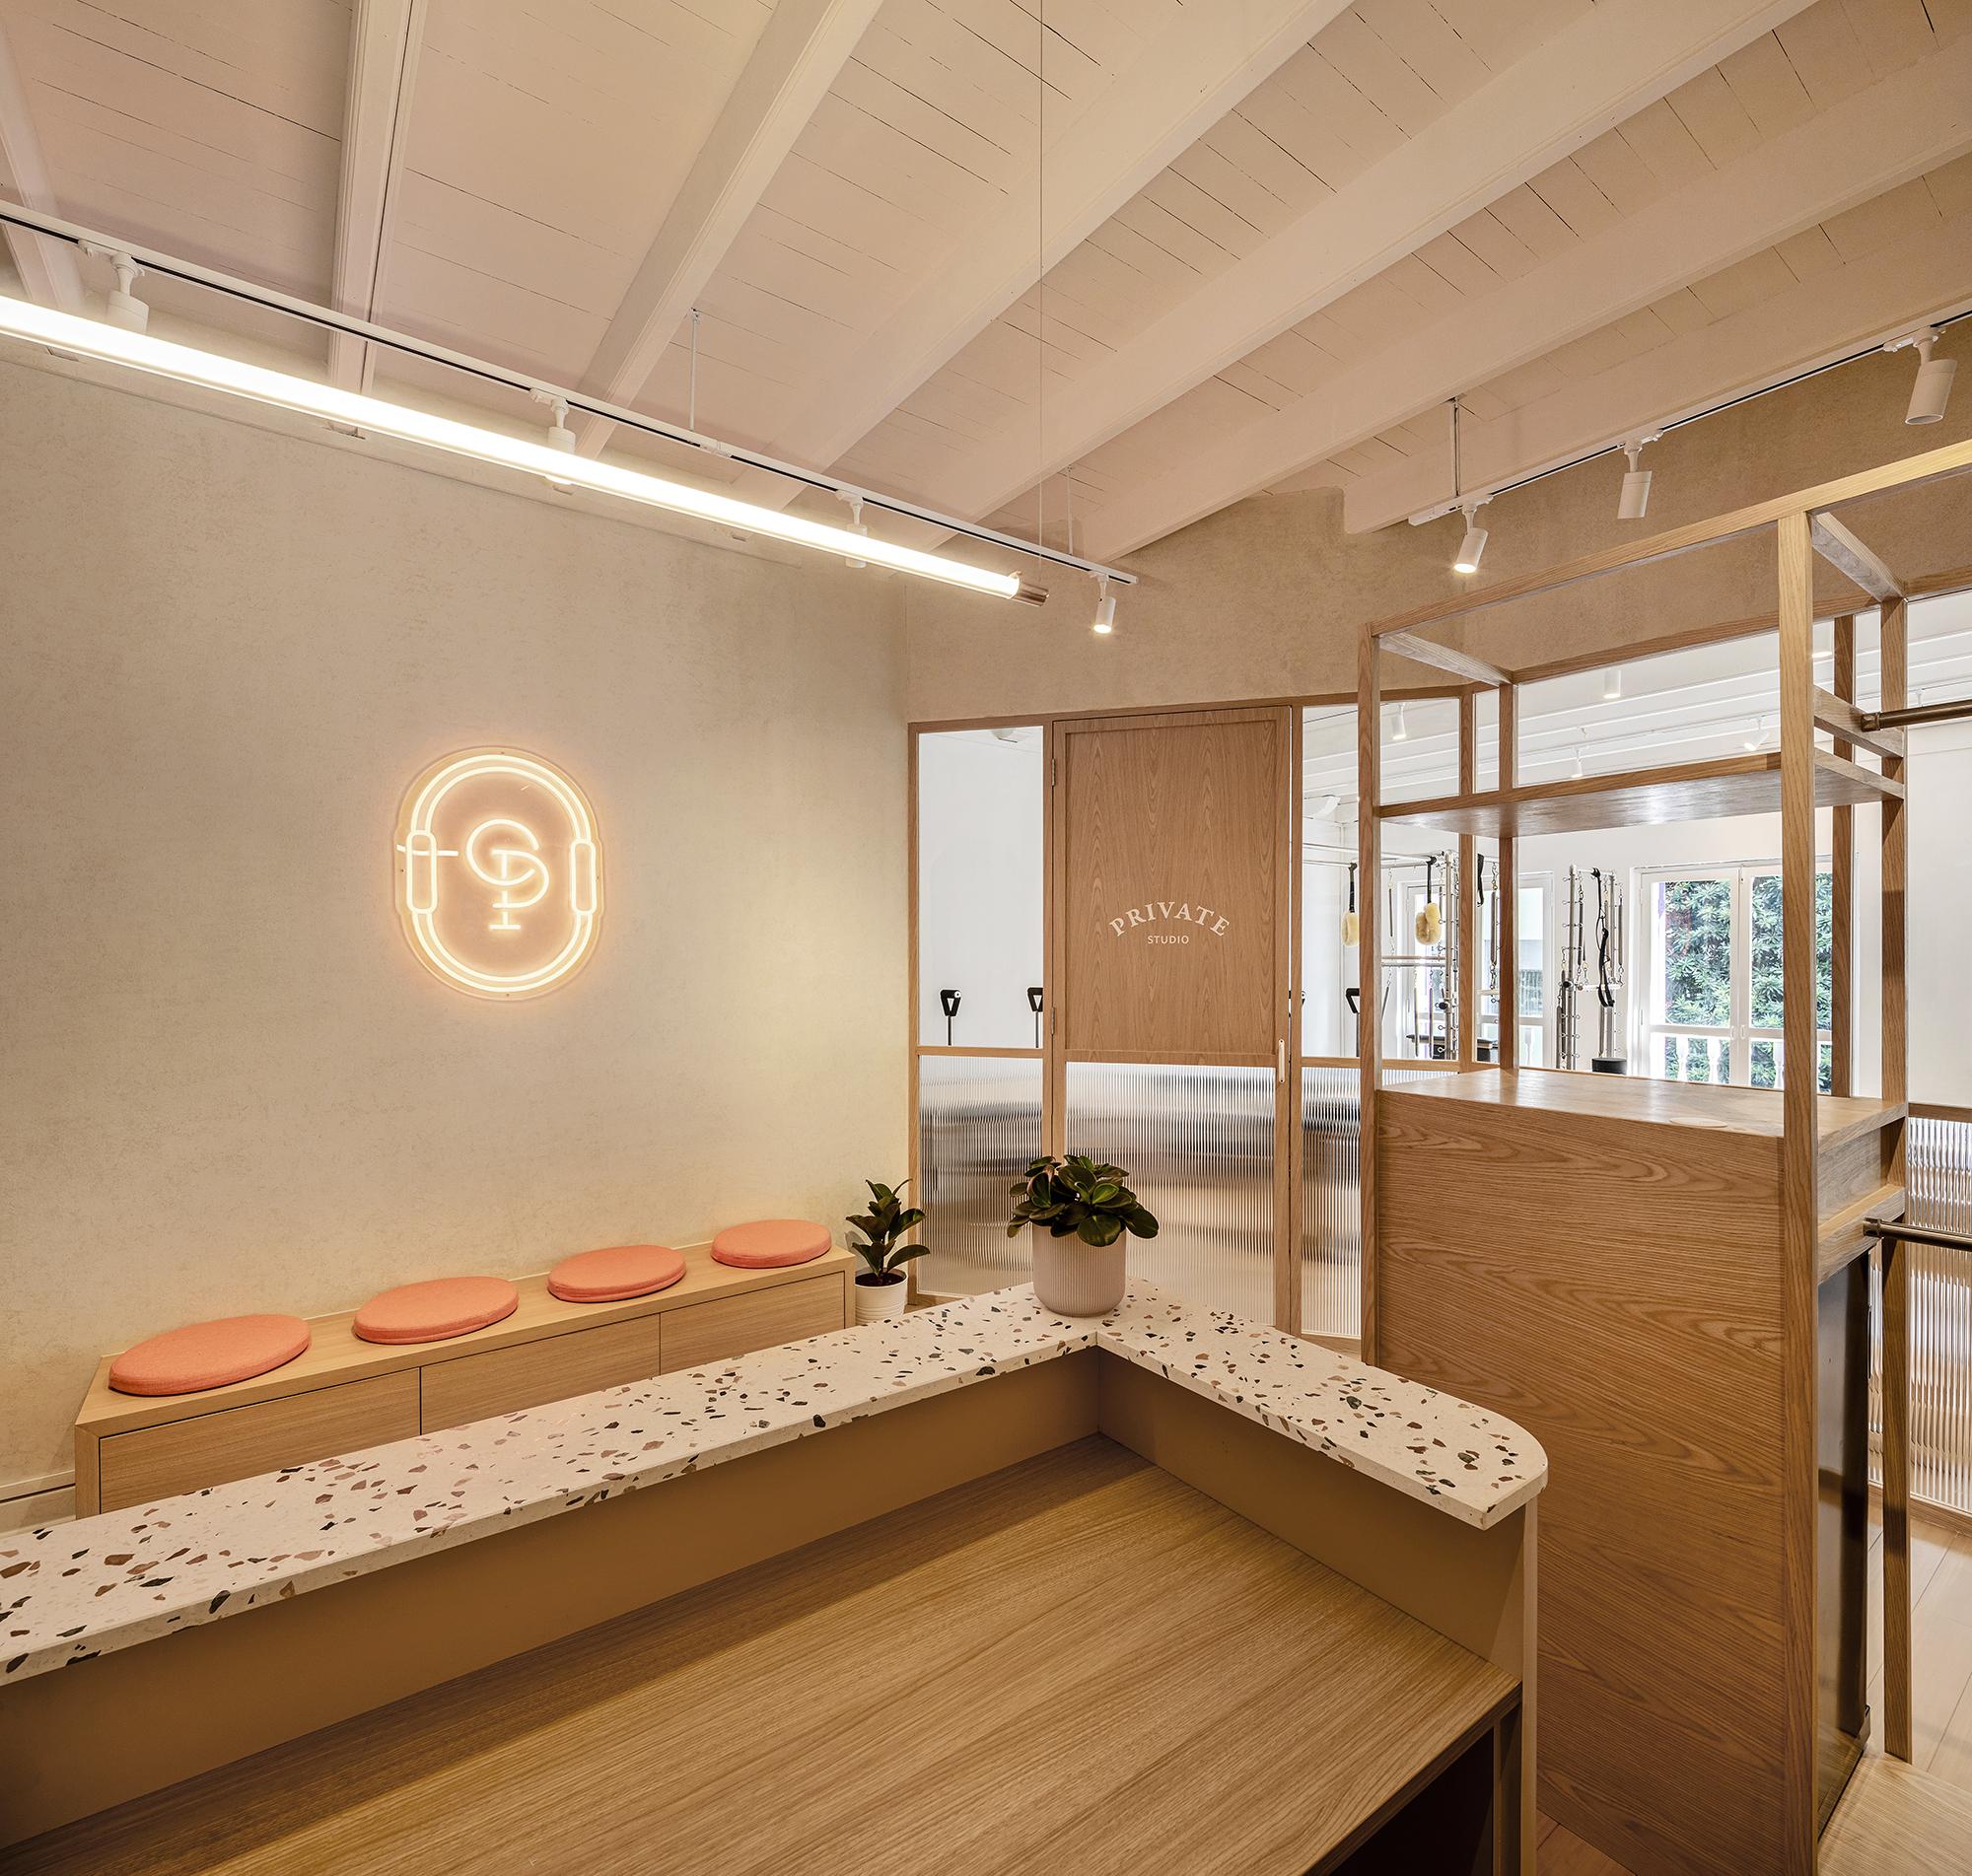 Shan Wong Interior Design - Off Duty Pilate Studio